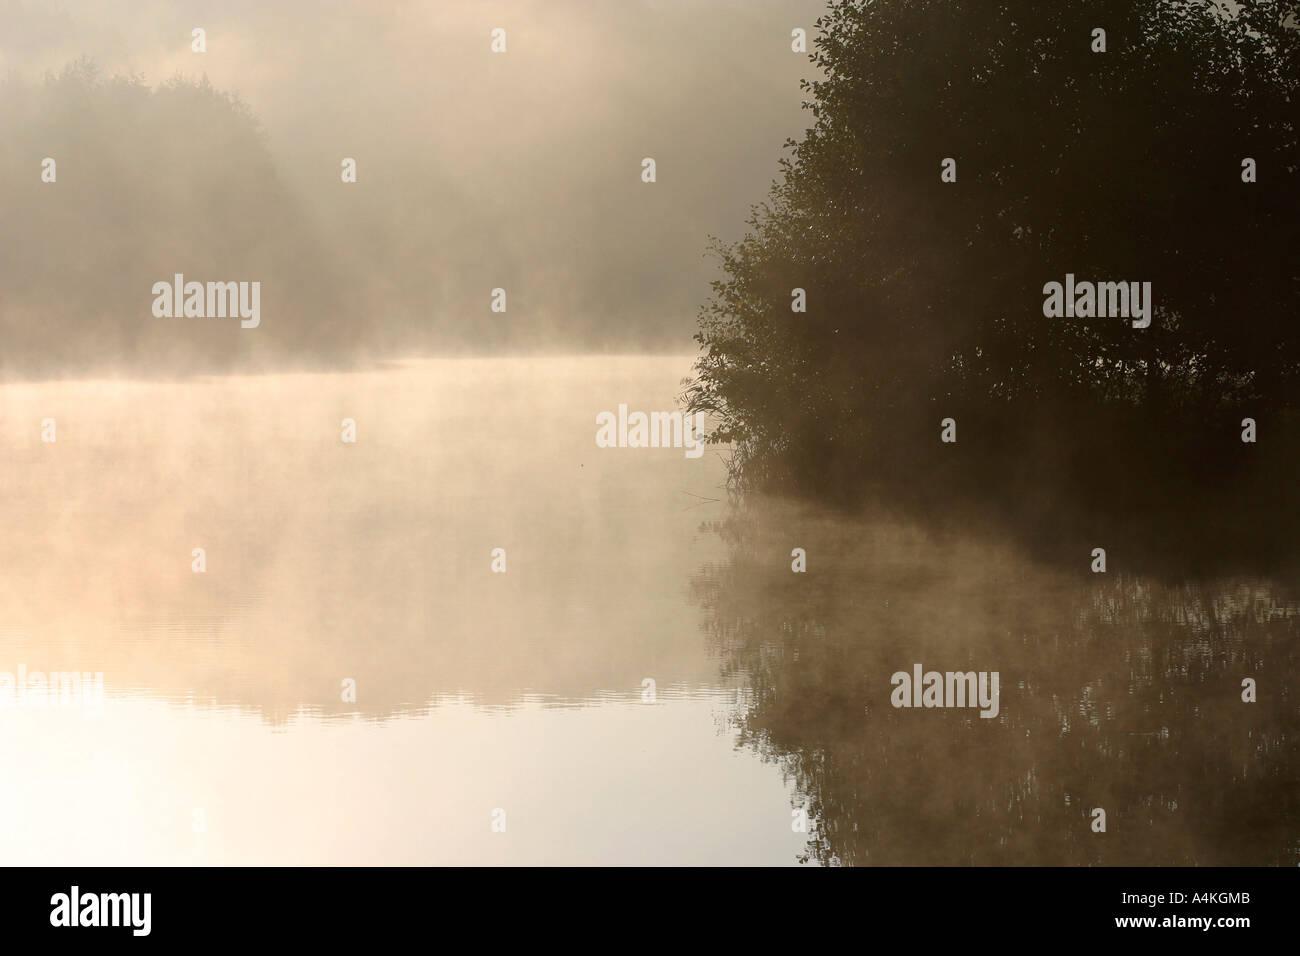 France, Jura, mist over pond - Stock Image